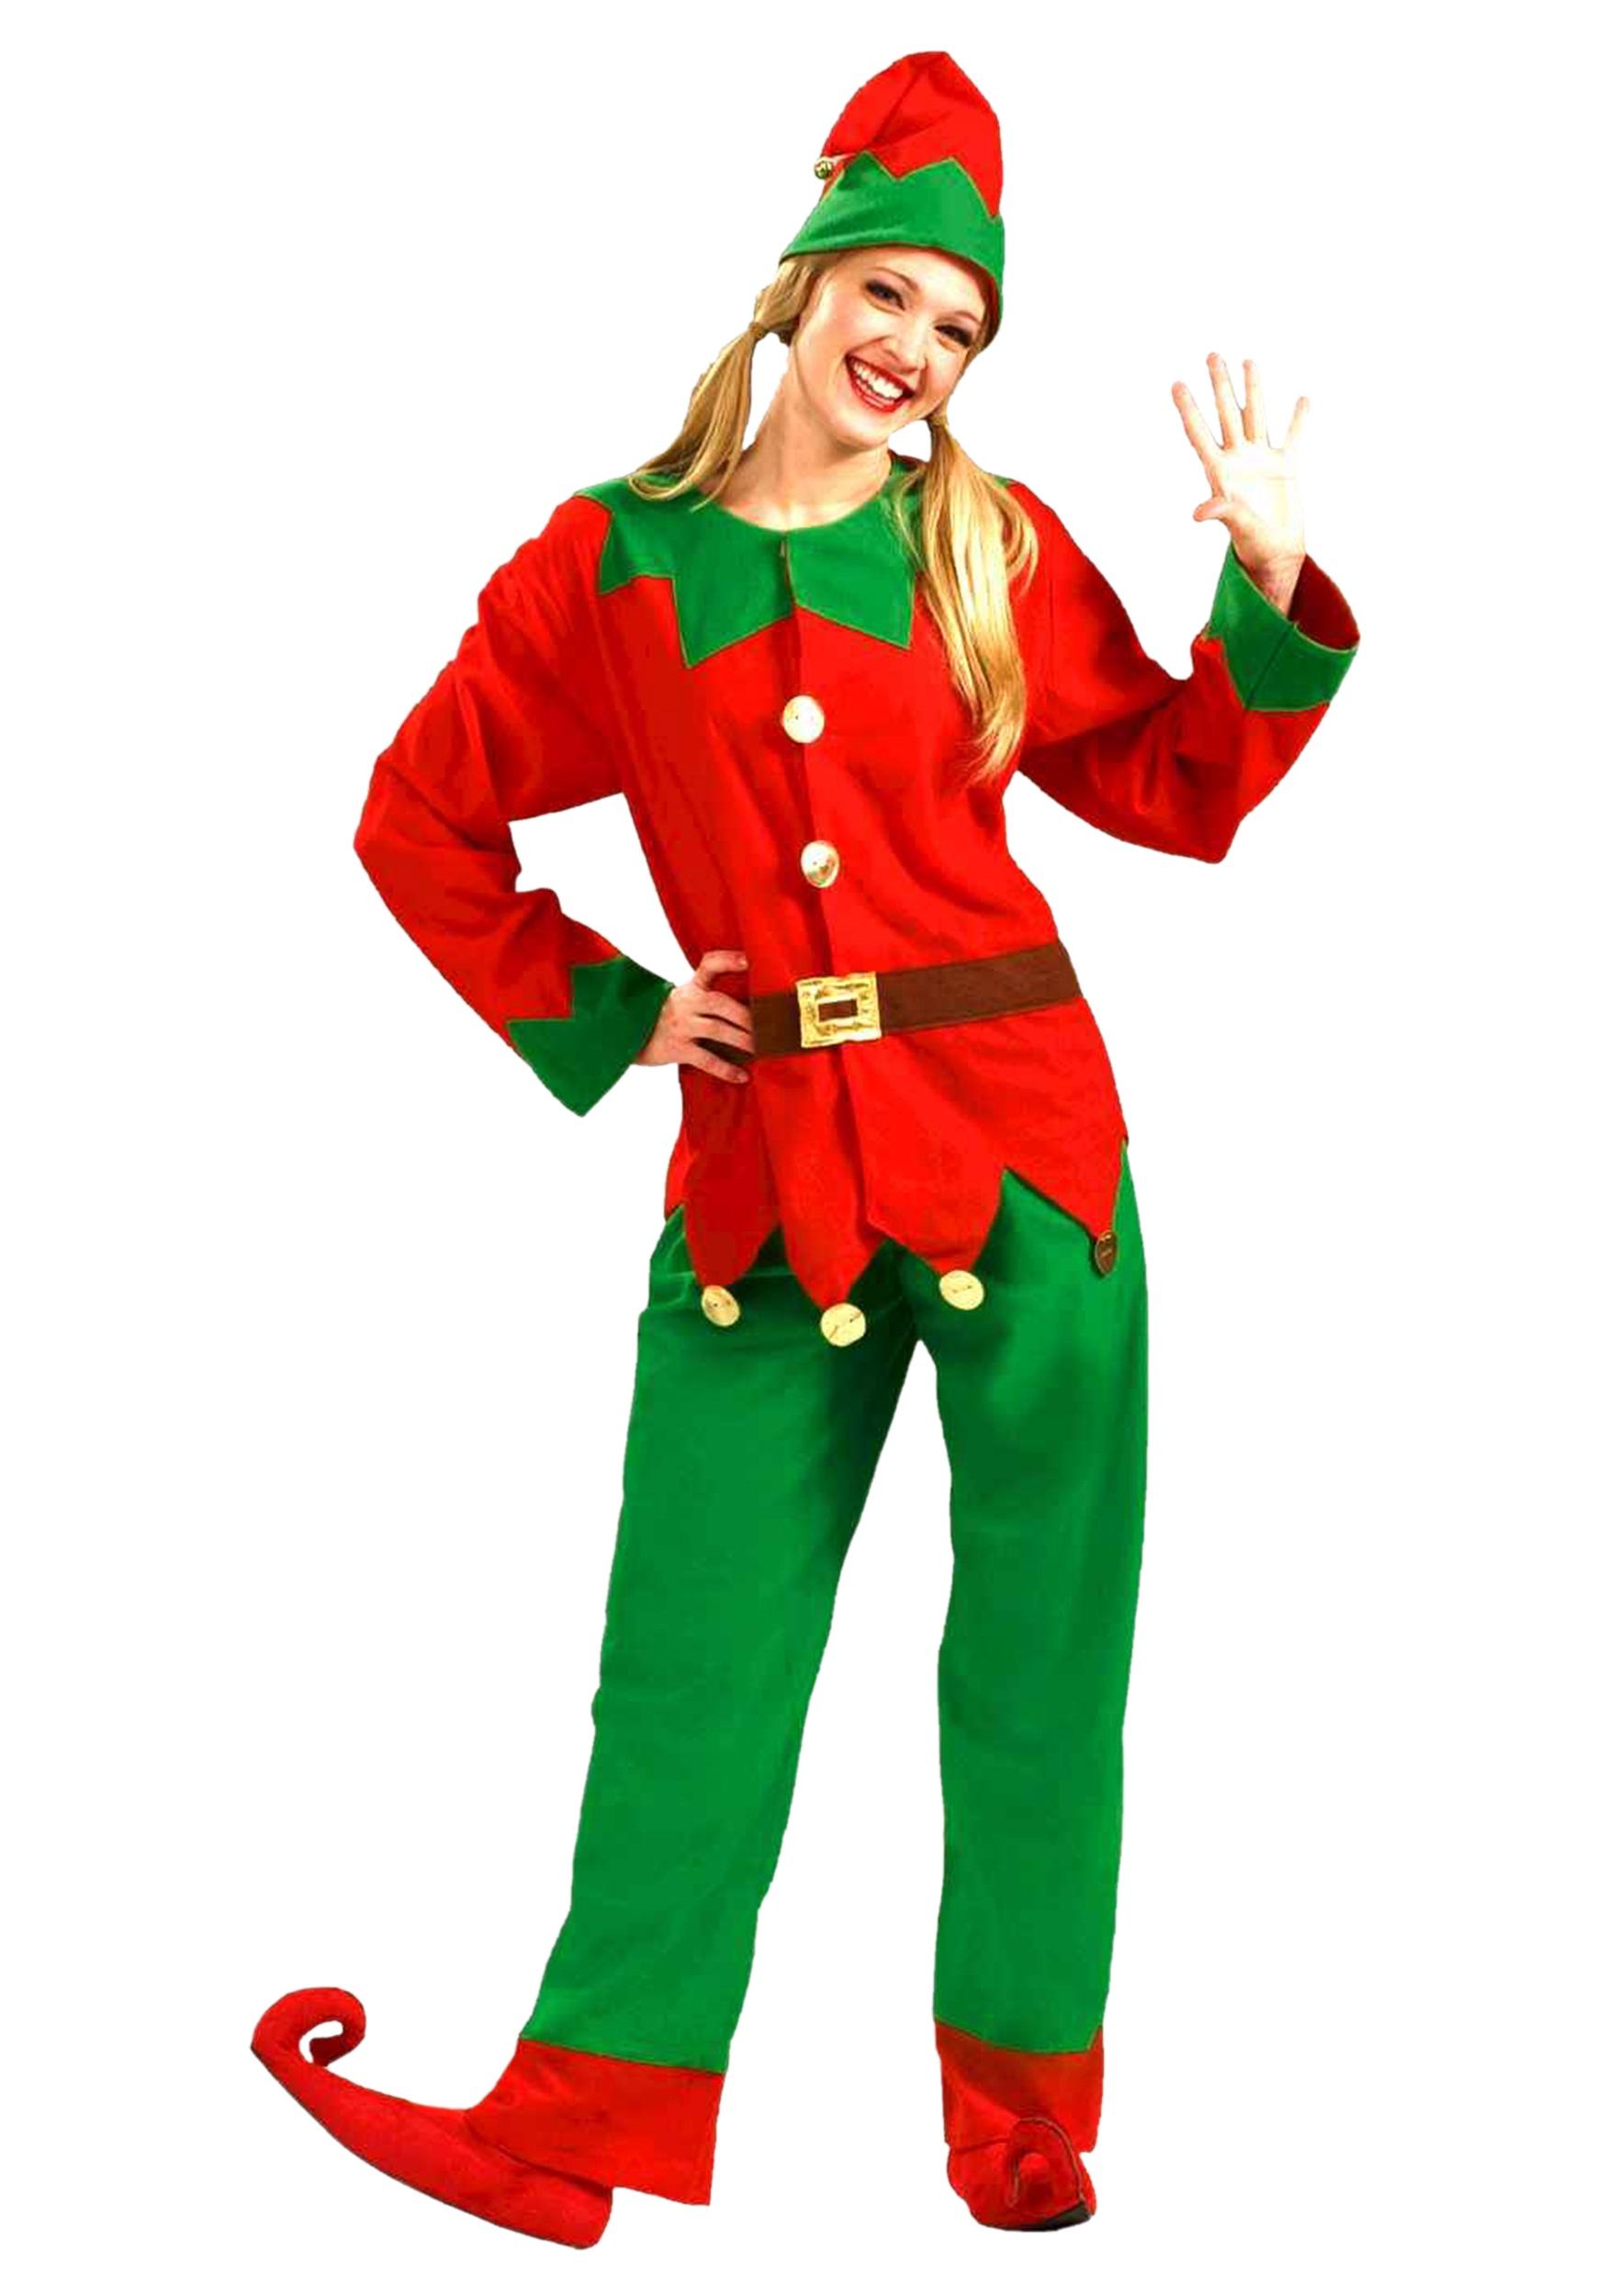 Adult Elf Costume - Adult Christmas Holiday Elf Costumes